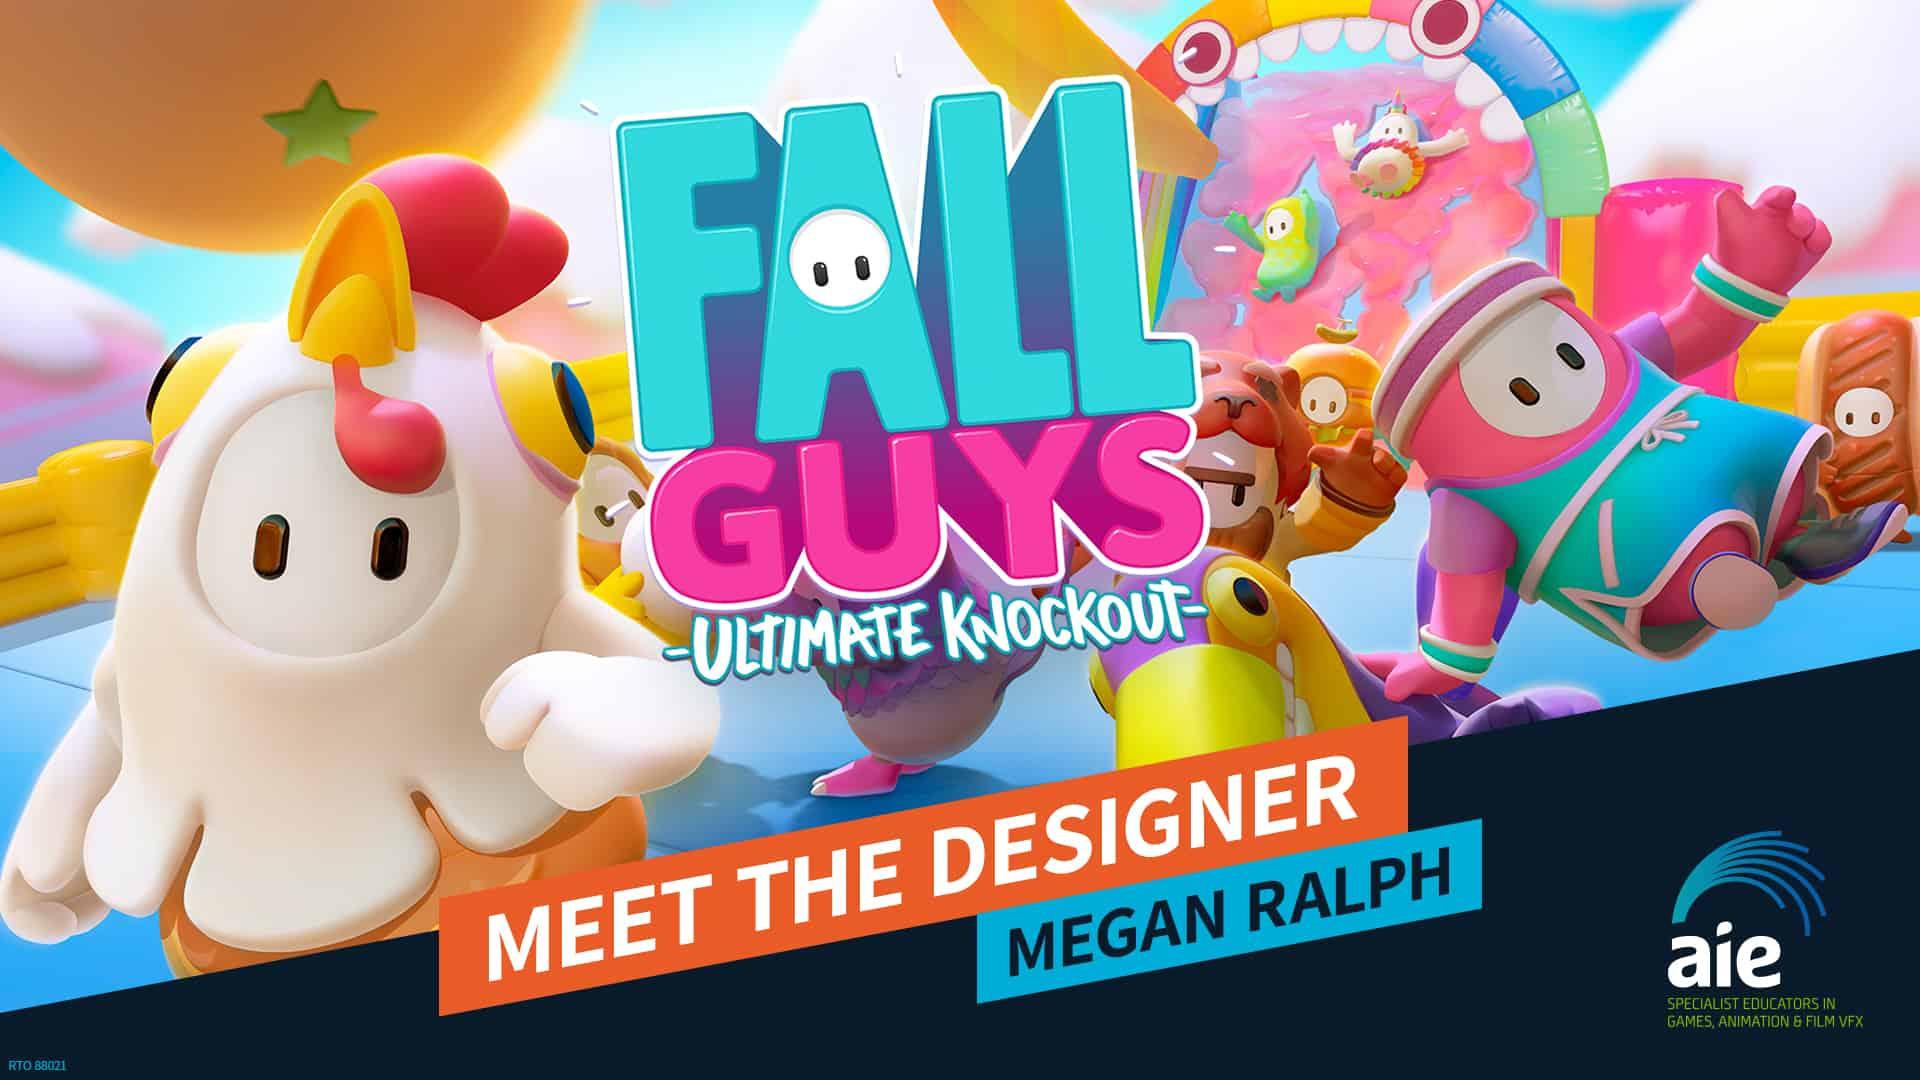 Meet the Designer: Megan Palph | AIE Workshop